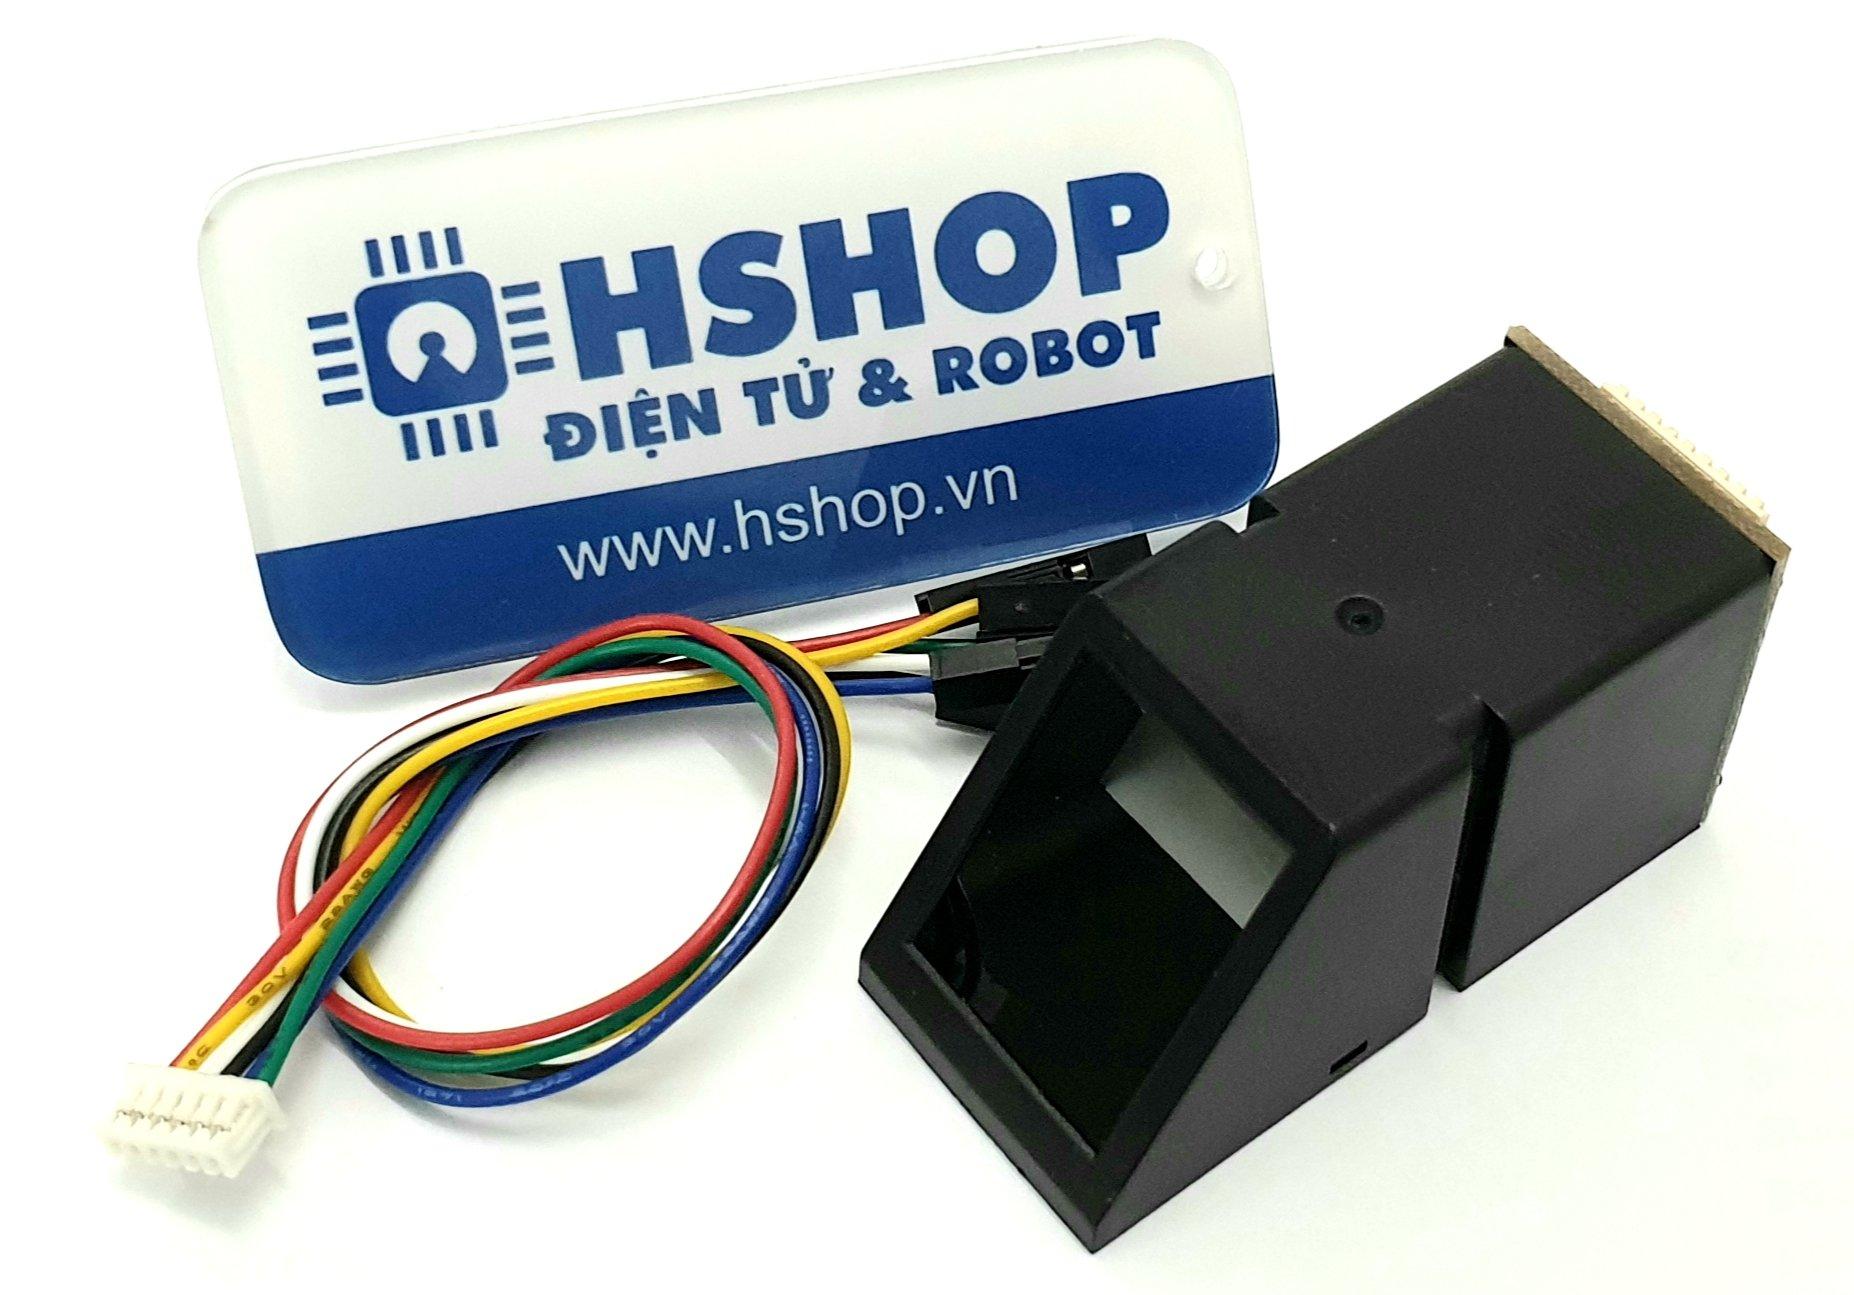 Cảm biến nhận dạng vân tay AS608 Fingerprint Sensor